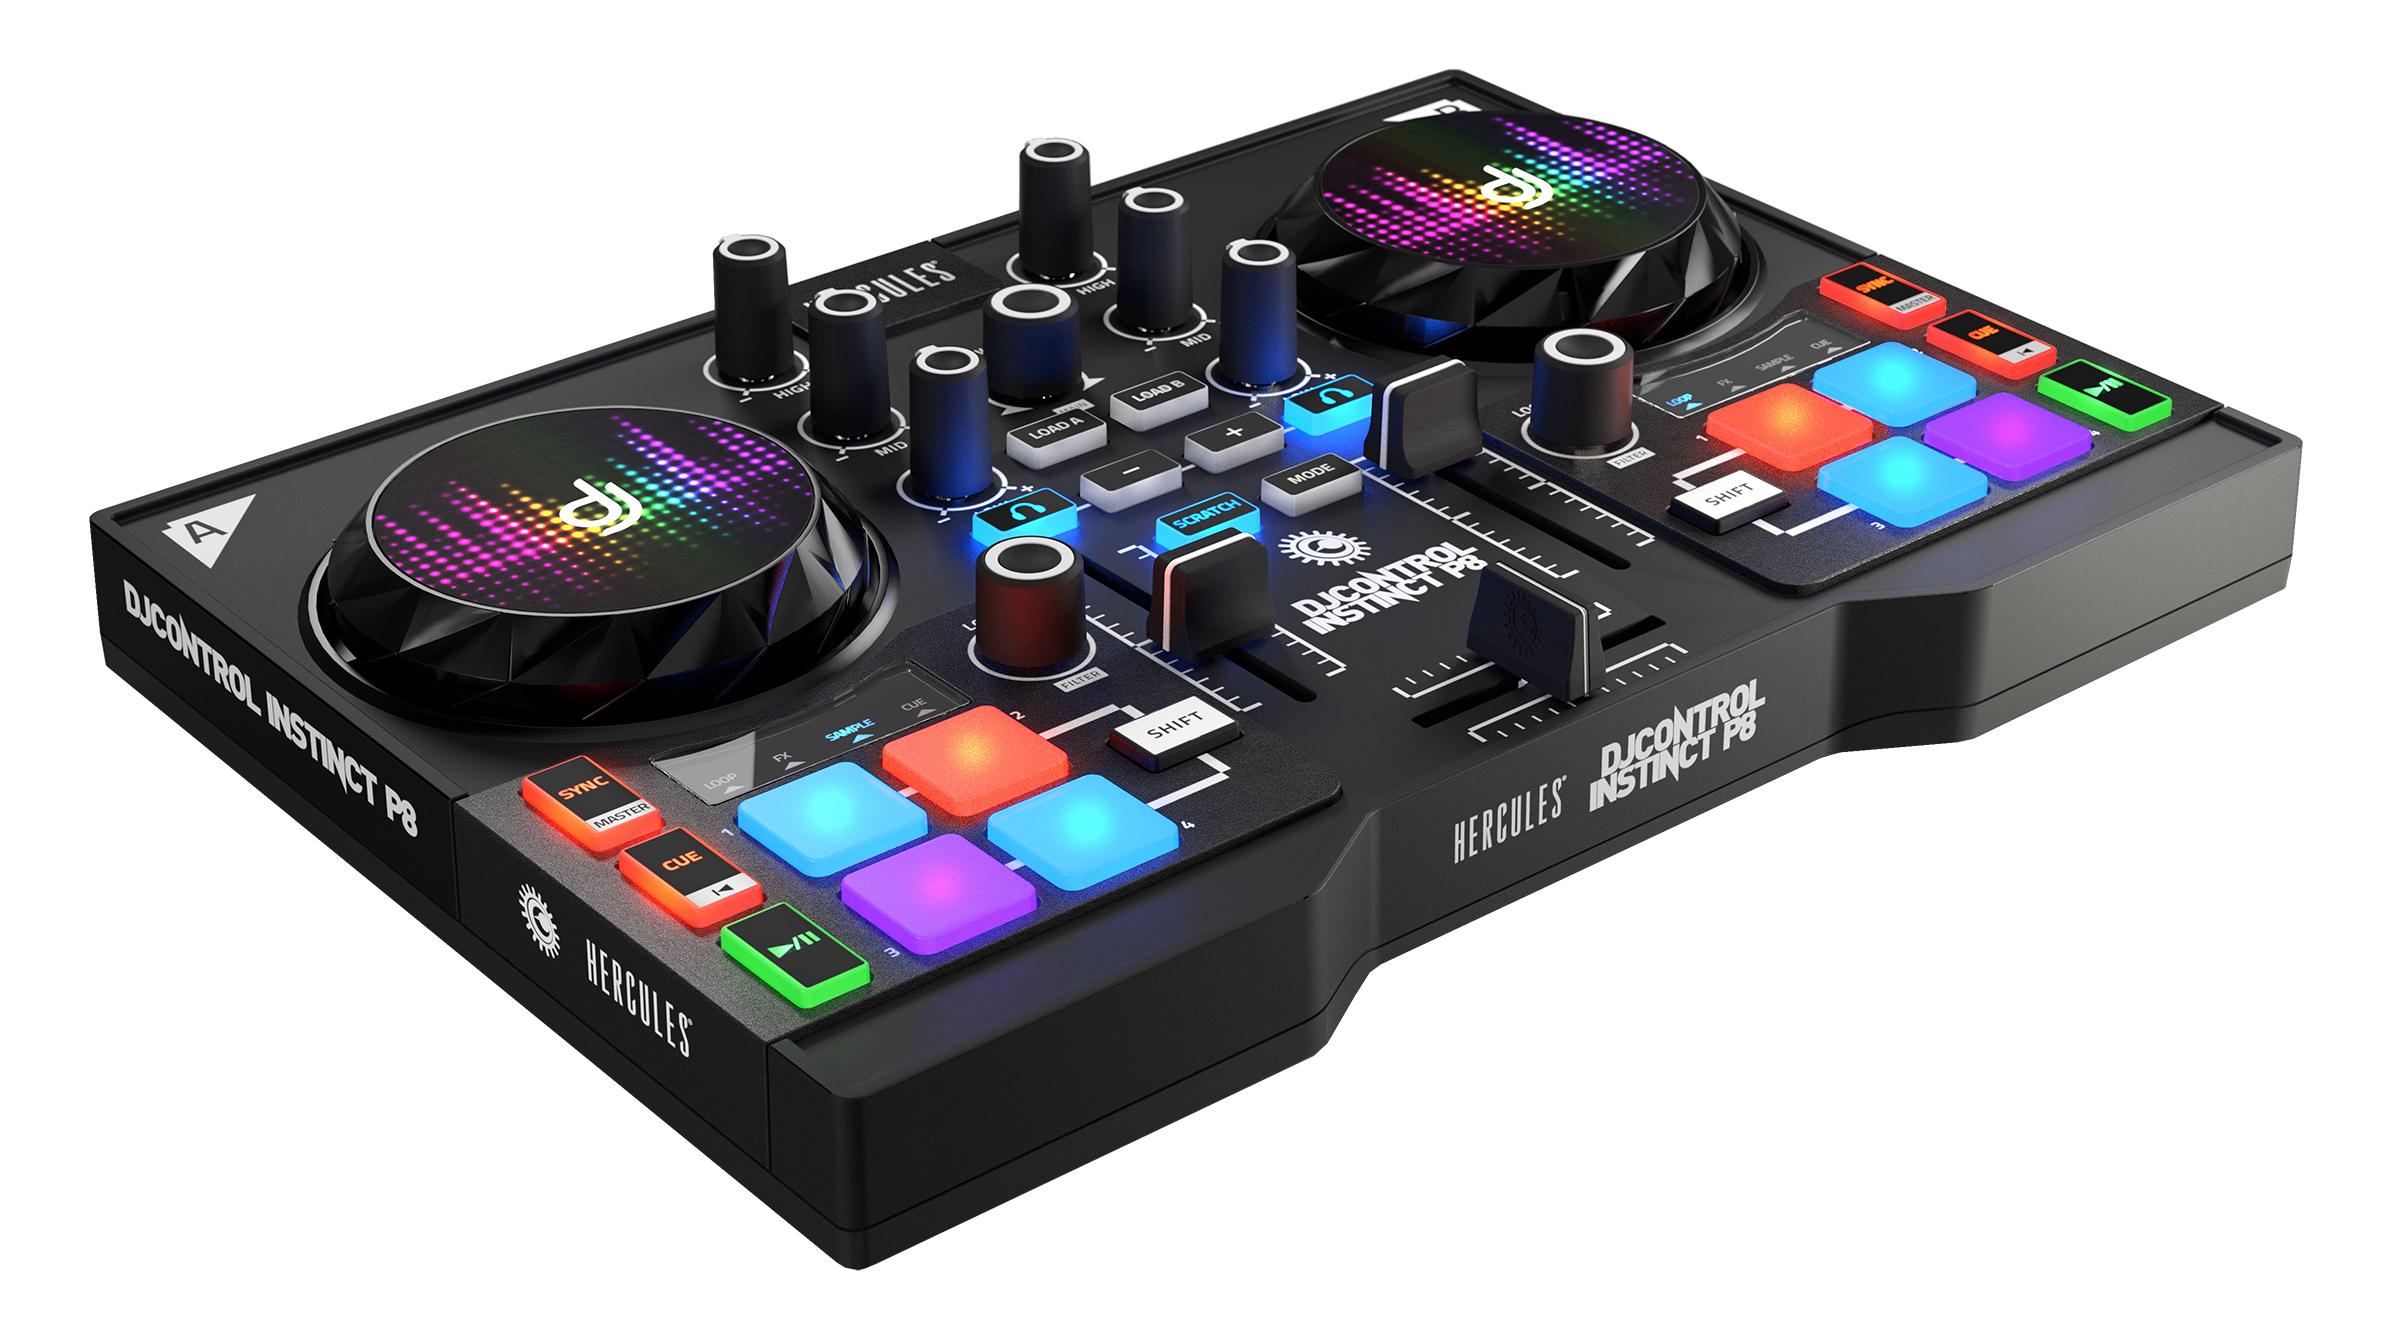 DJControl Instinct P8